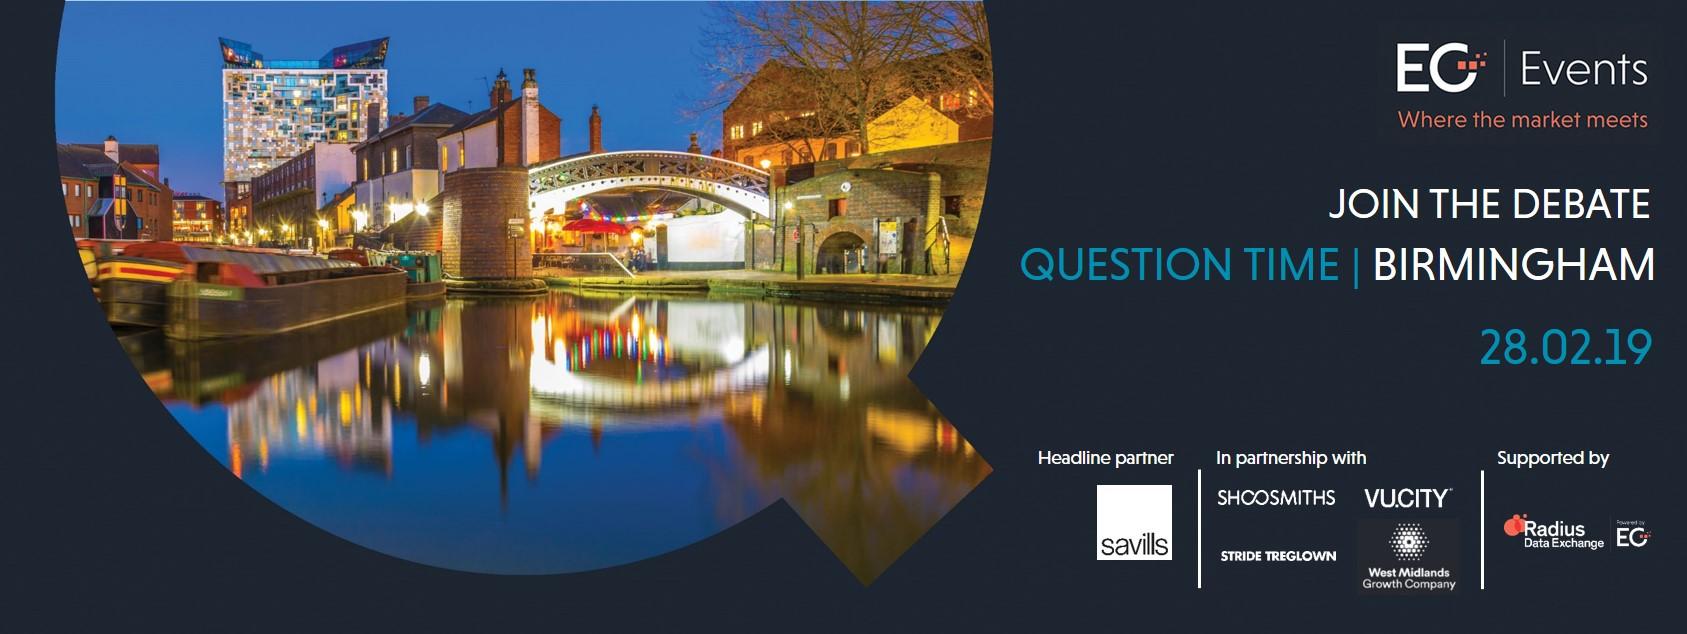 EG Question Time Belfast | 17.09.18